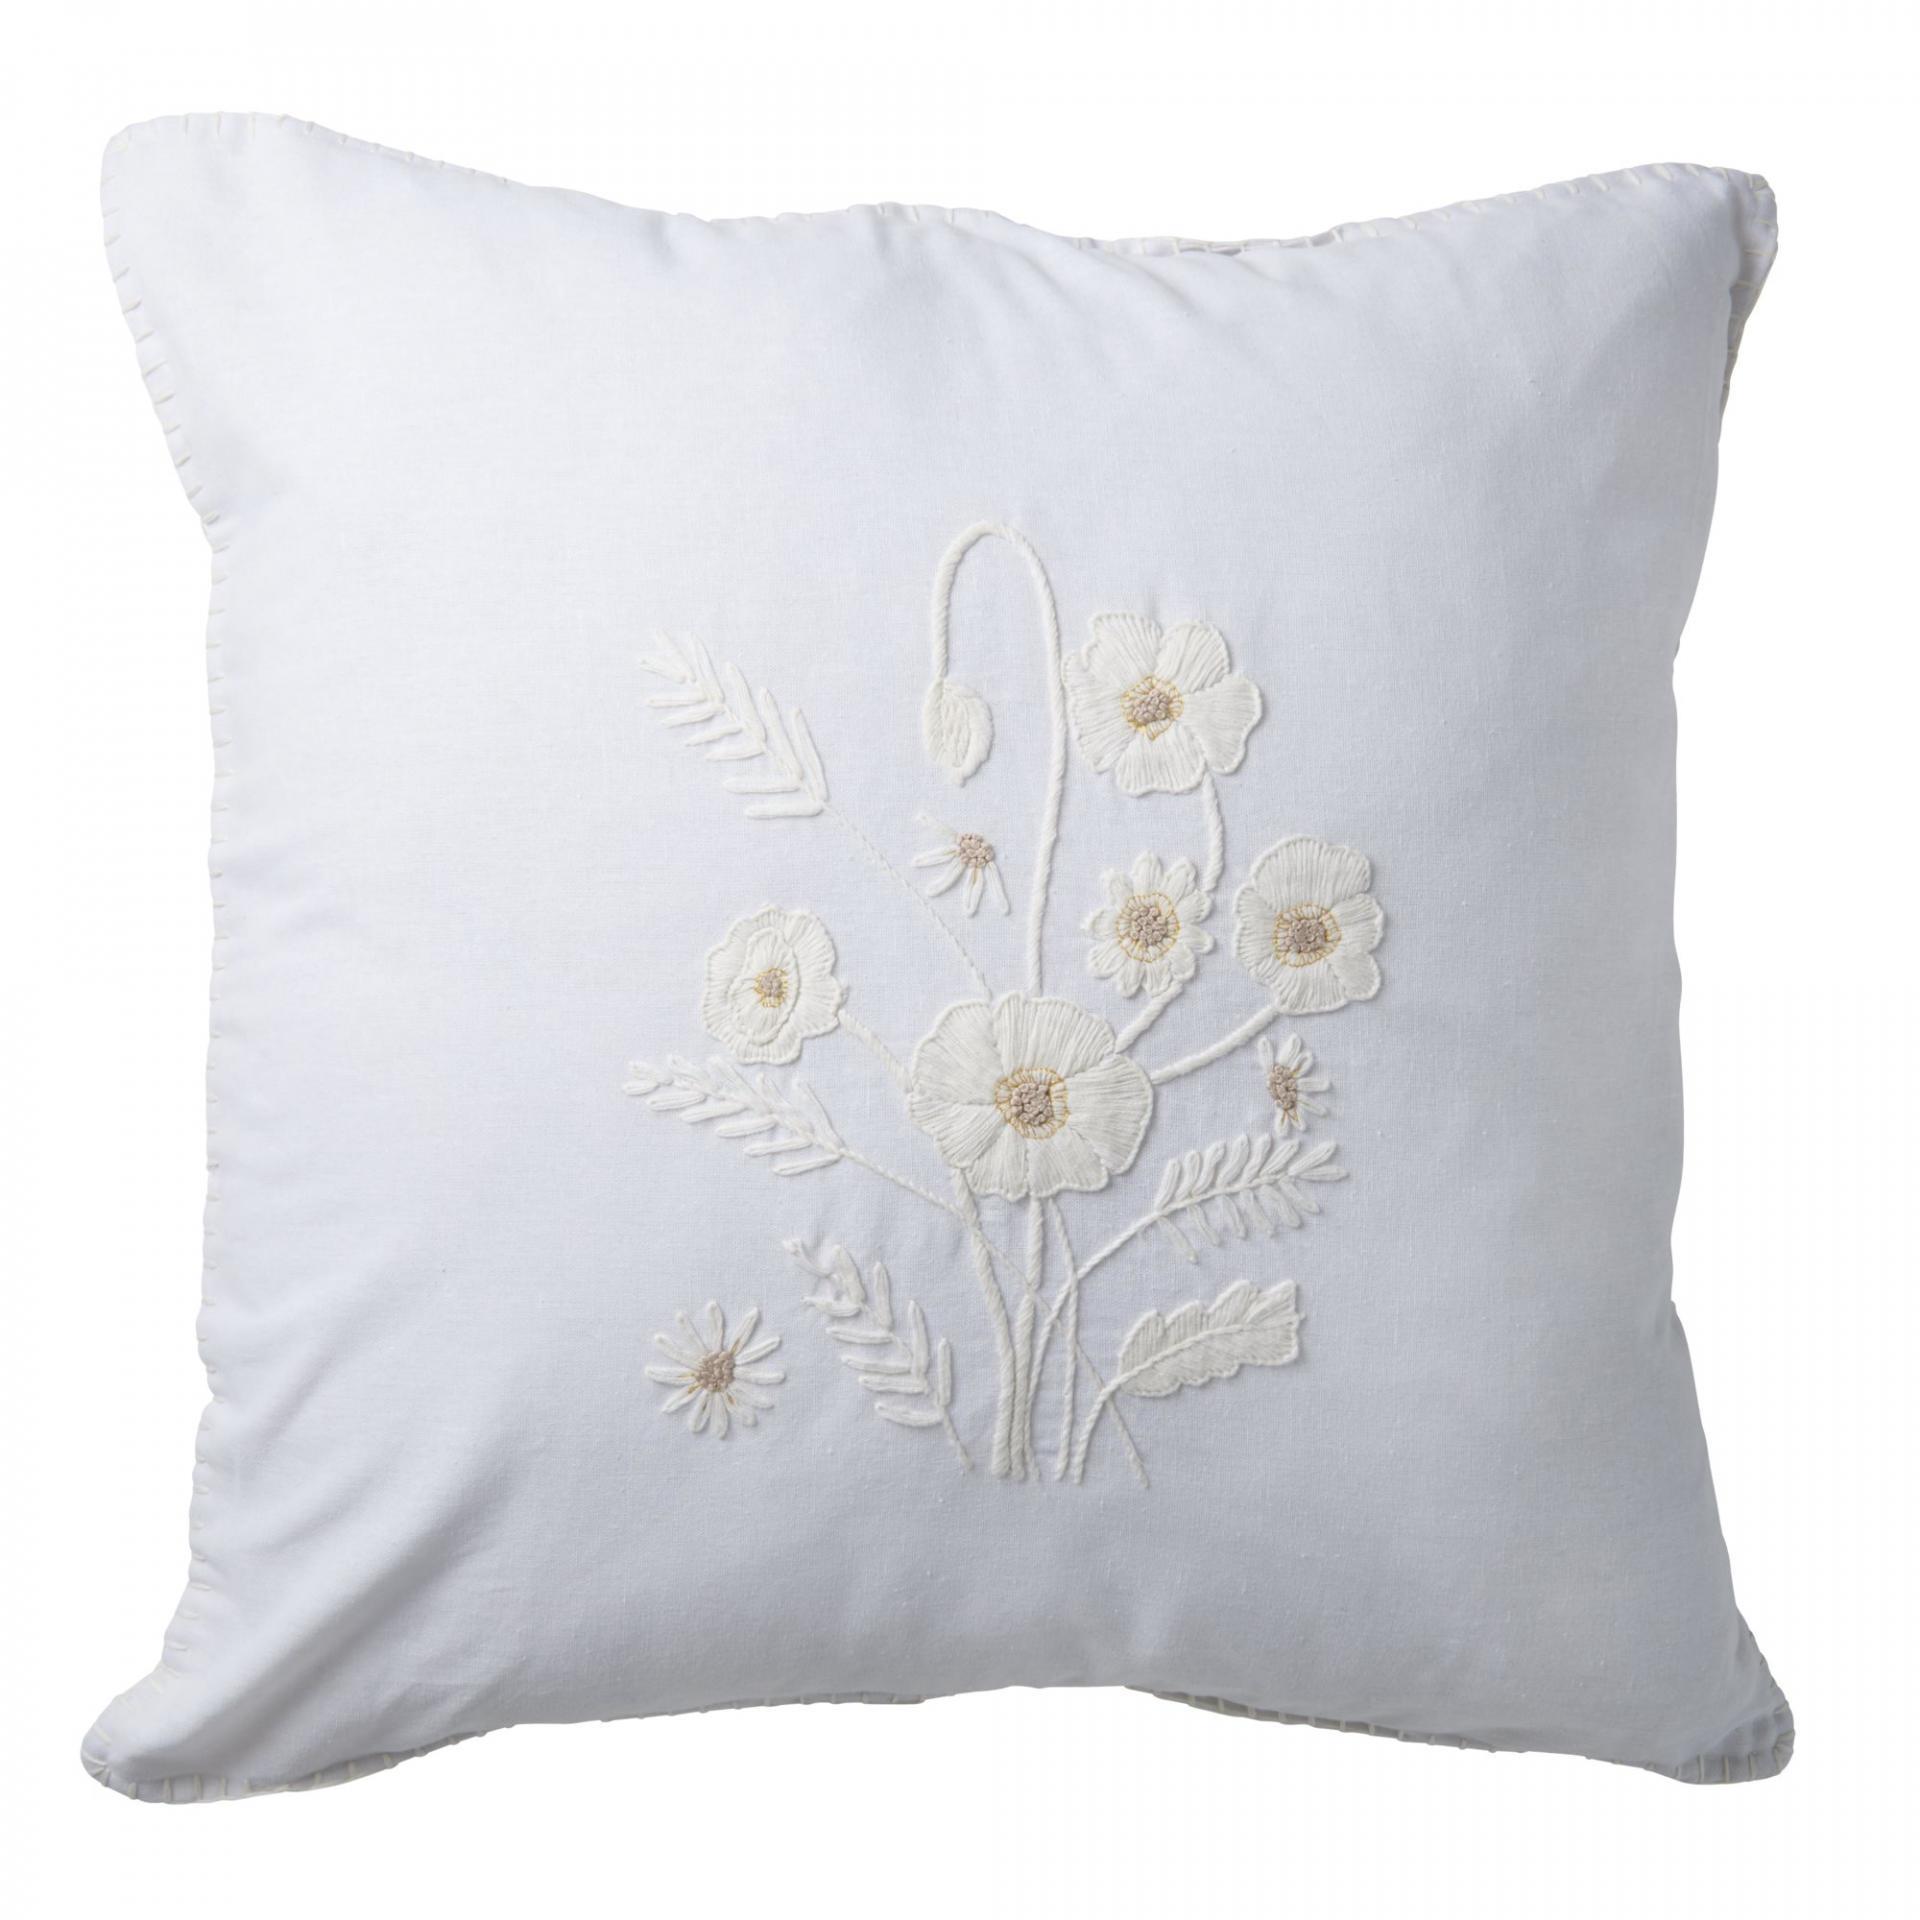 rice Lněný povlak na polštář Flowers Cream 60x60 cm, bílá barva, krémová barva, textil